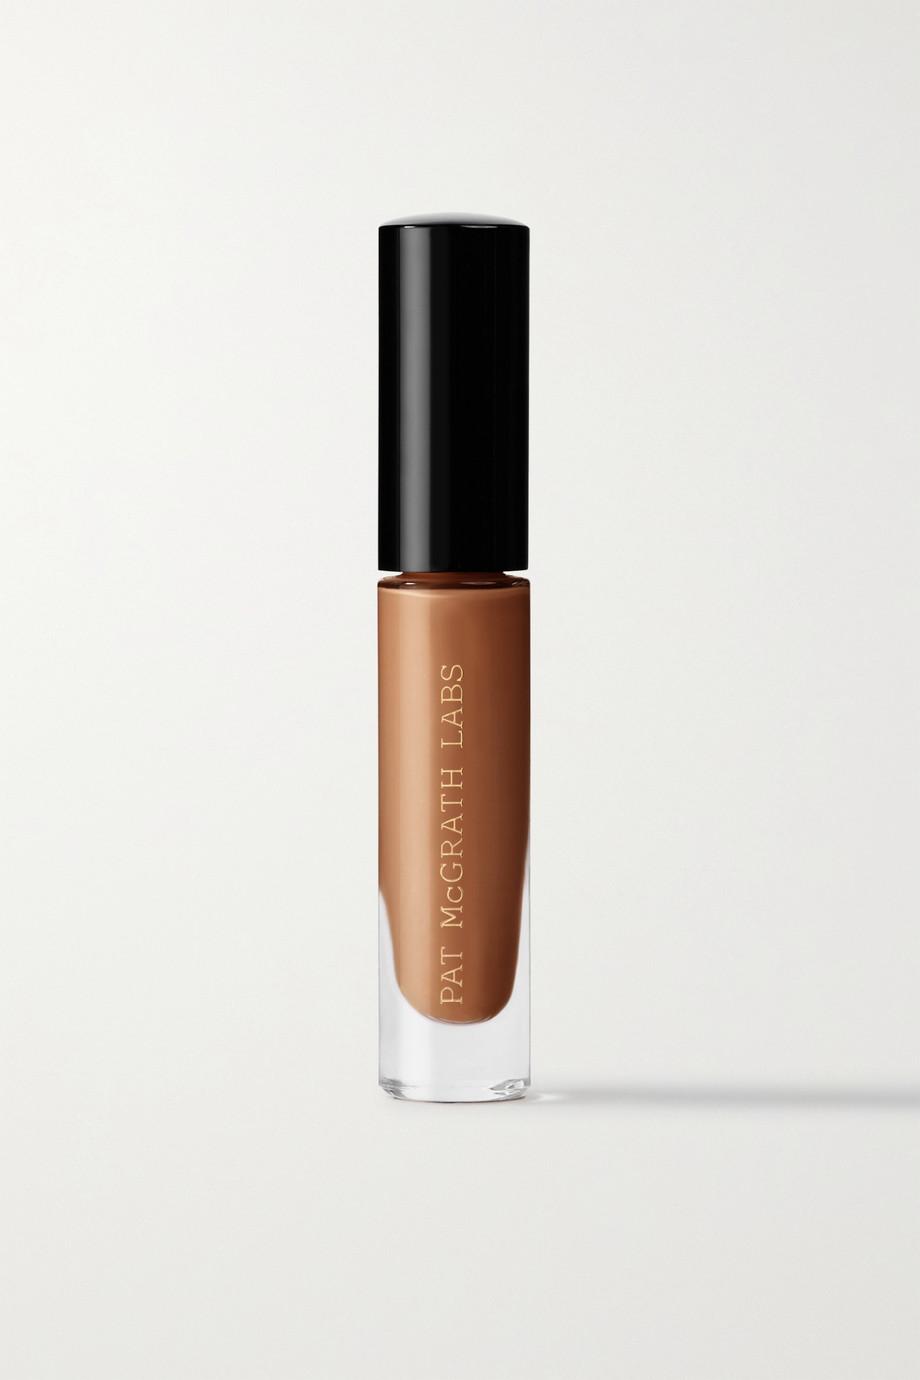 Pat McGrath Labs Skin Fetish: Sublime Perfection Concealer - MD24, 5ml